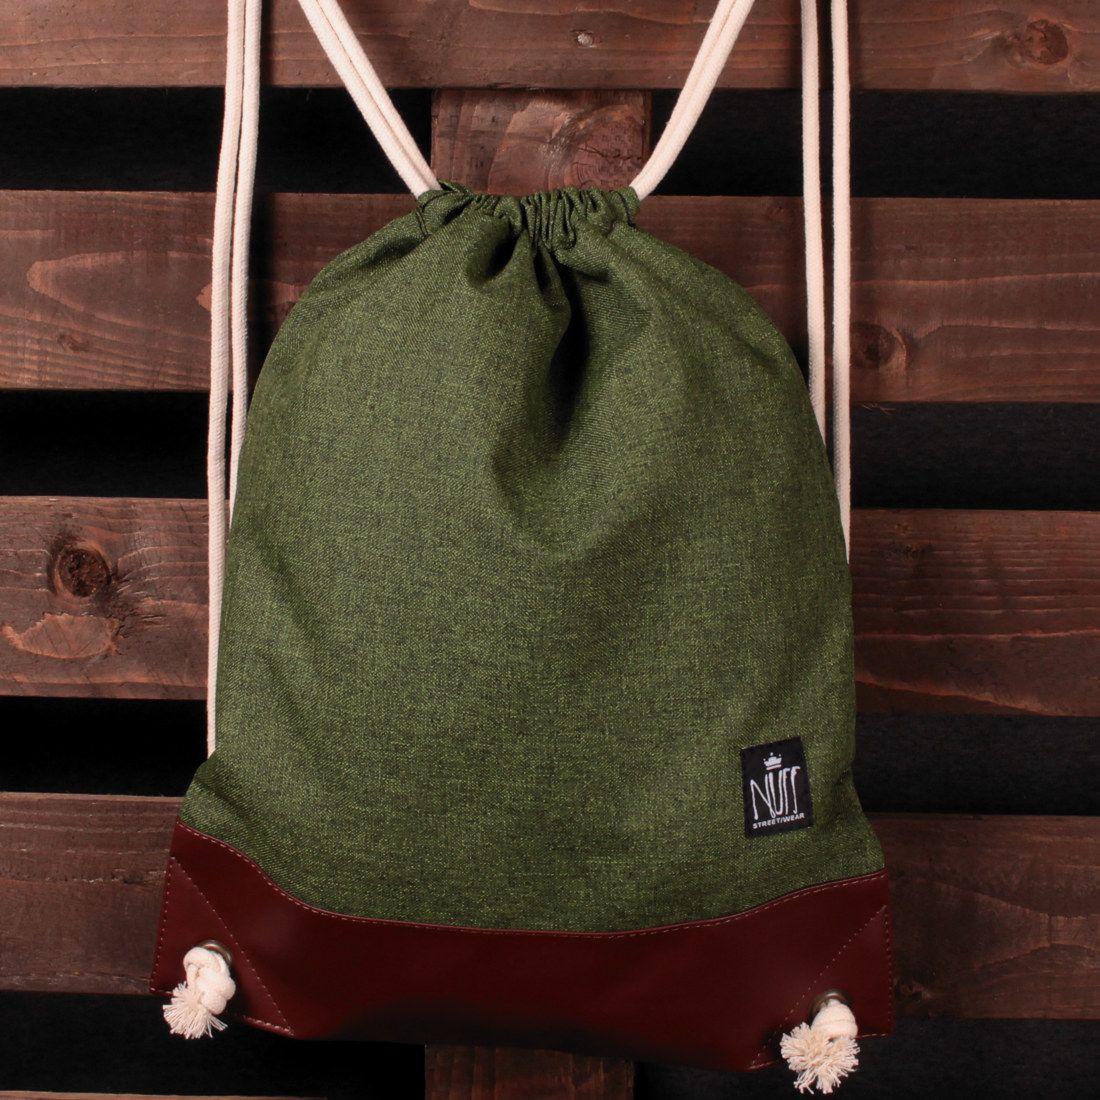 a041acbbf2eae GALANTERIA » Plecaki i worki » Worko-plecak Nuff